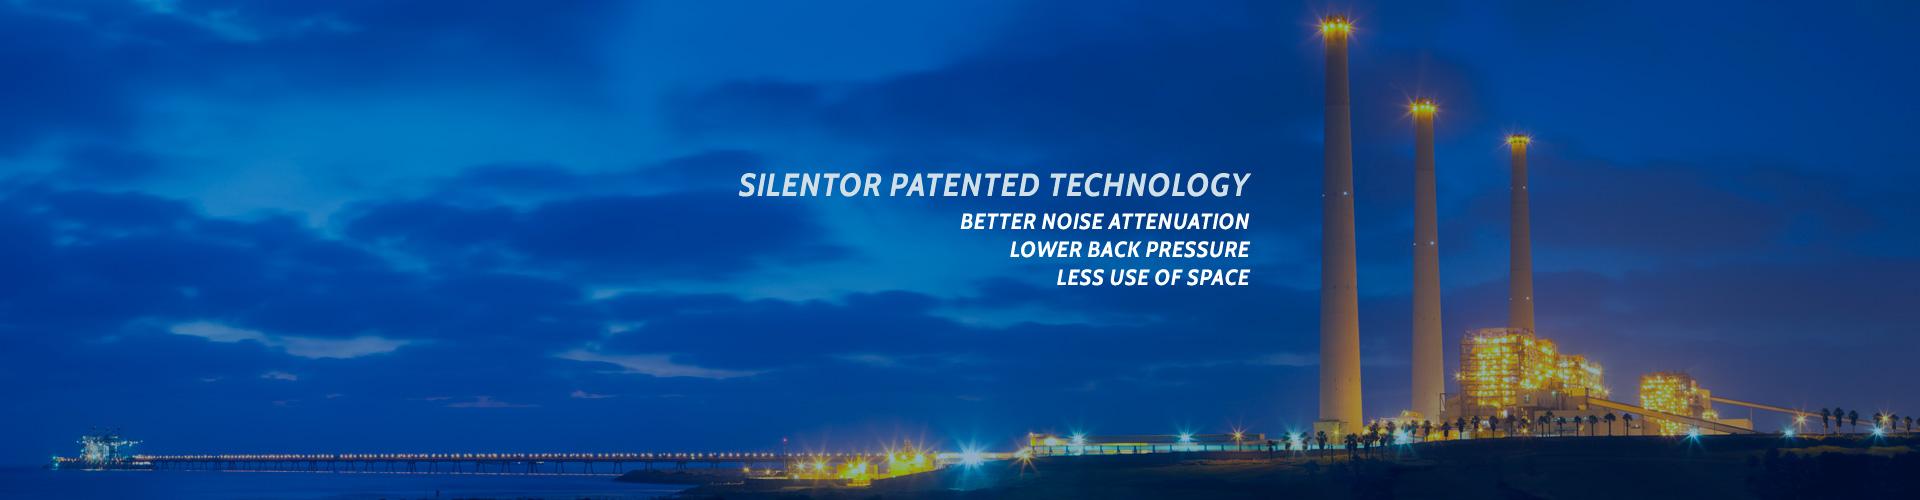 silentor-banner-industry